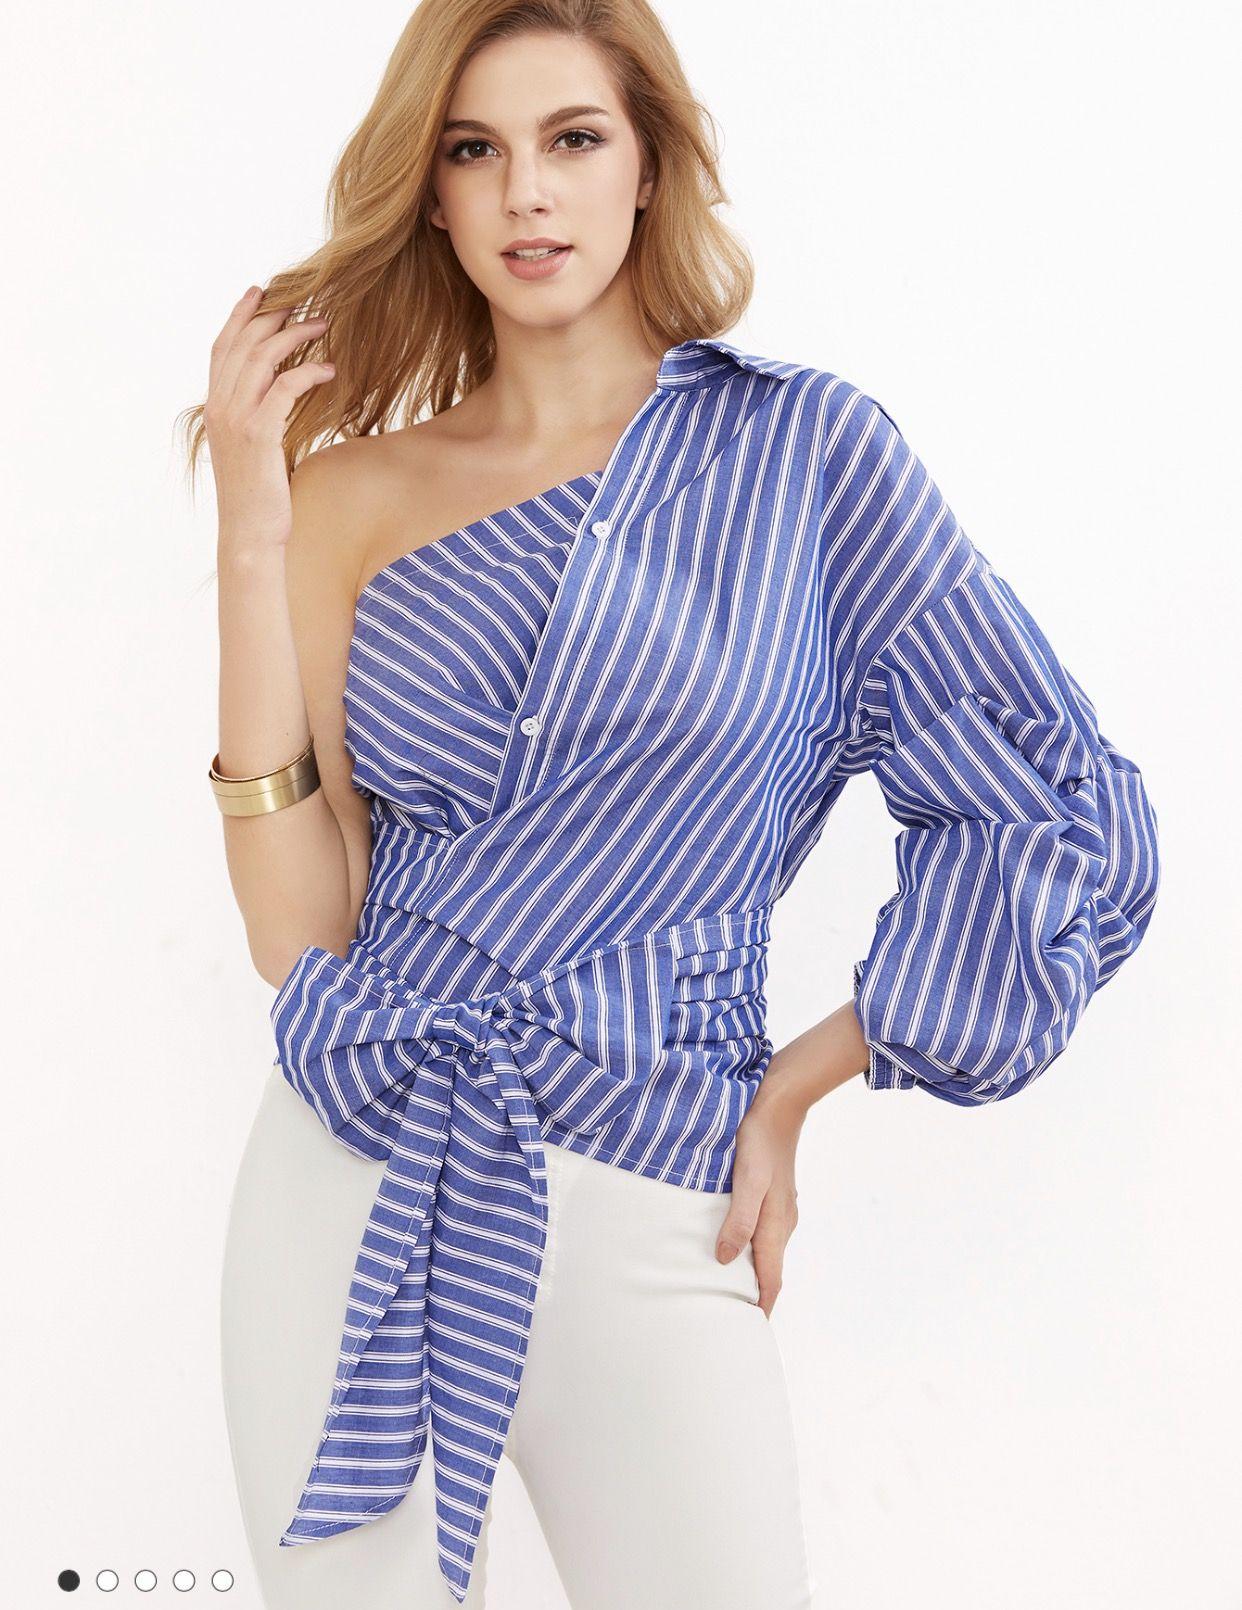 0542096d0c265 She in super bien porter quand il fera plus chaud Shirt Dress